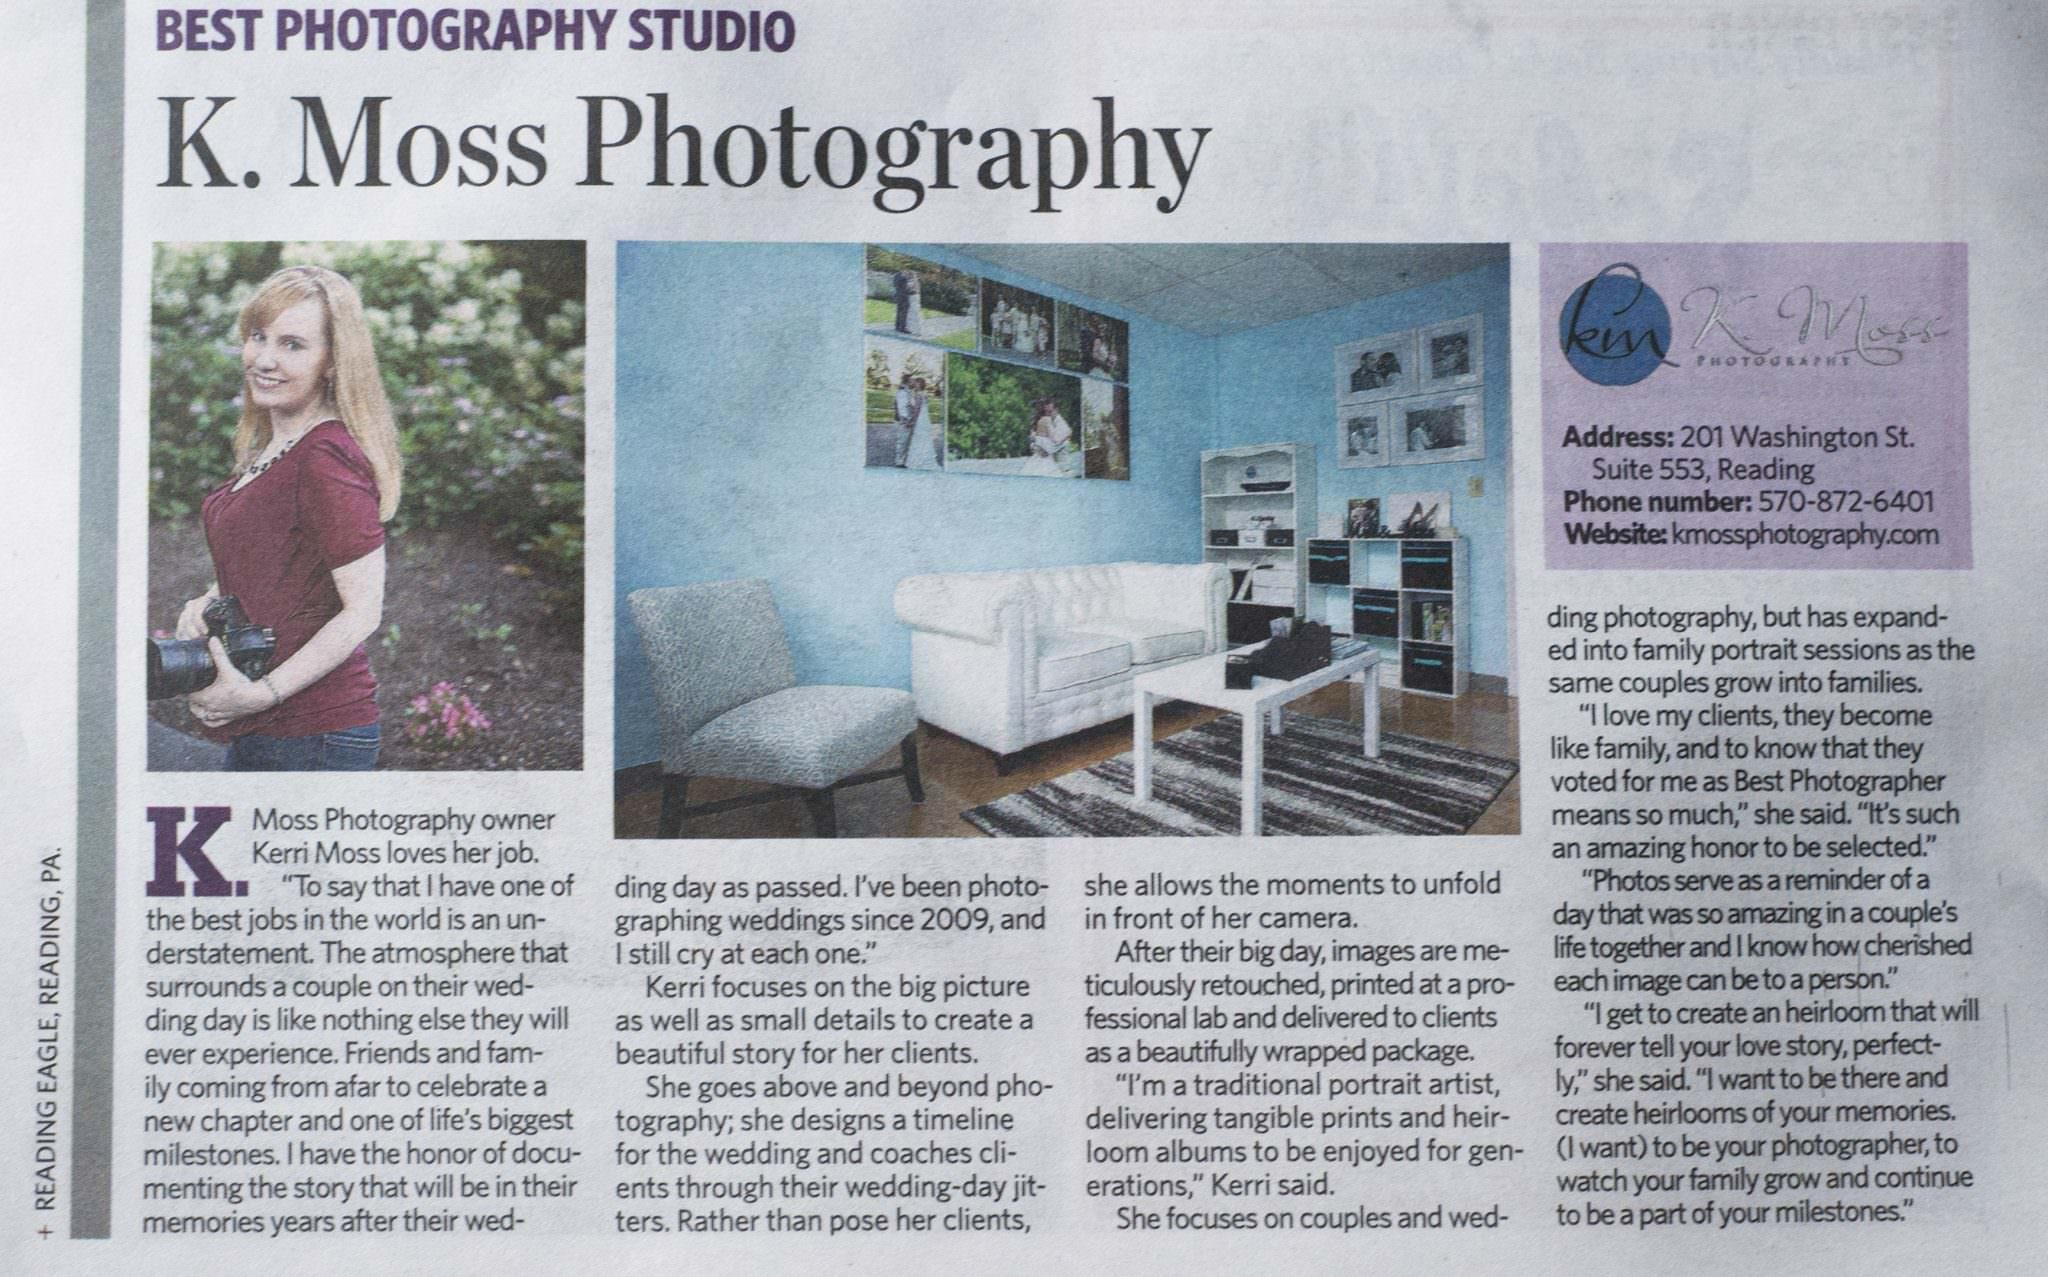 Best Photography Studio Award Berks County PA   K. Moss Photography